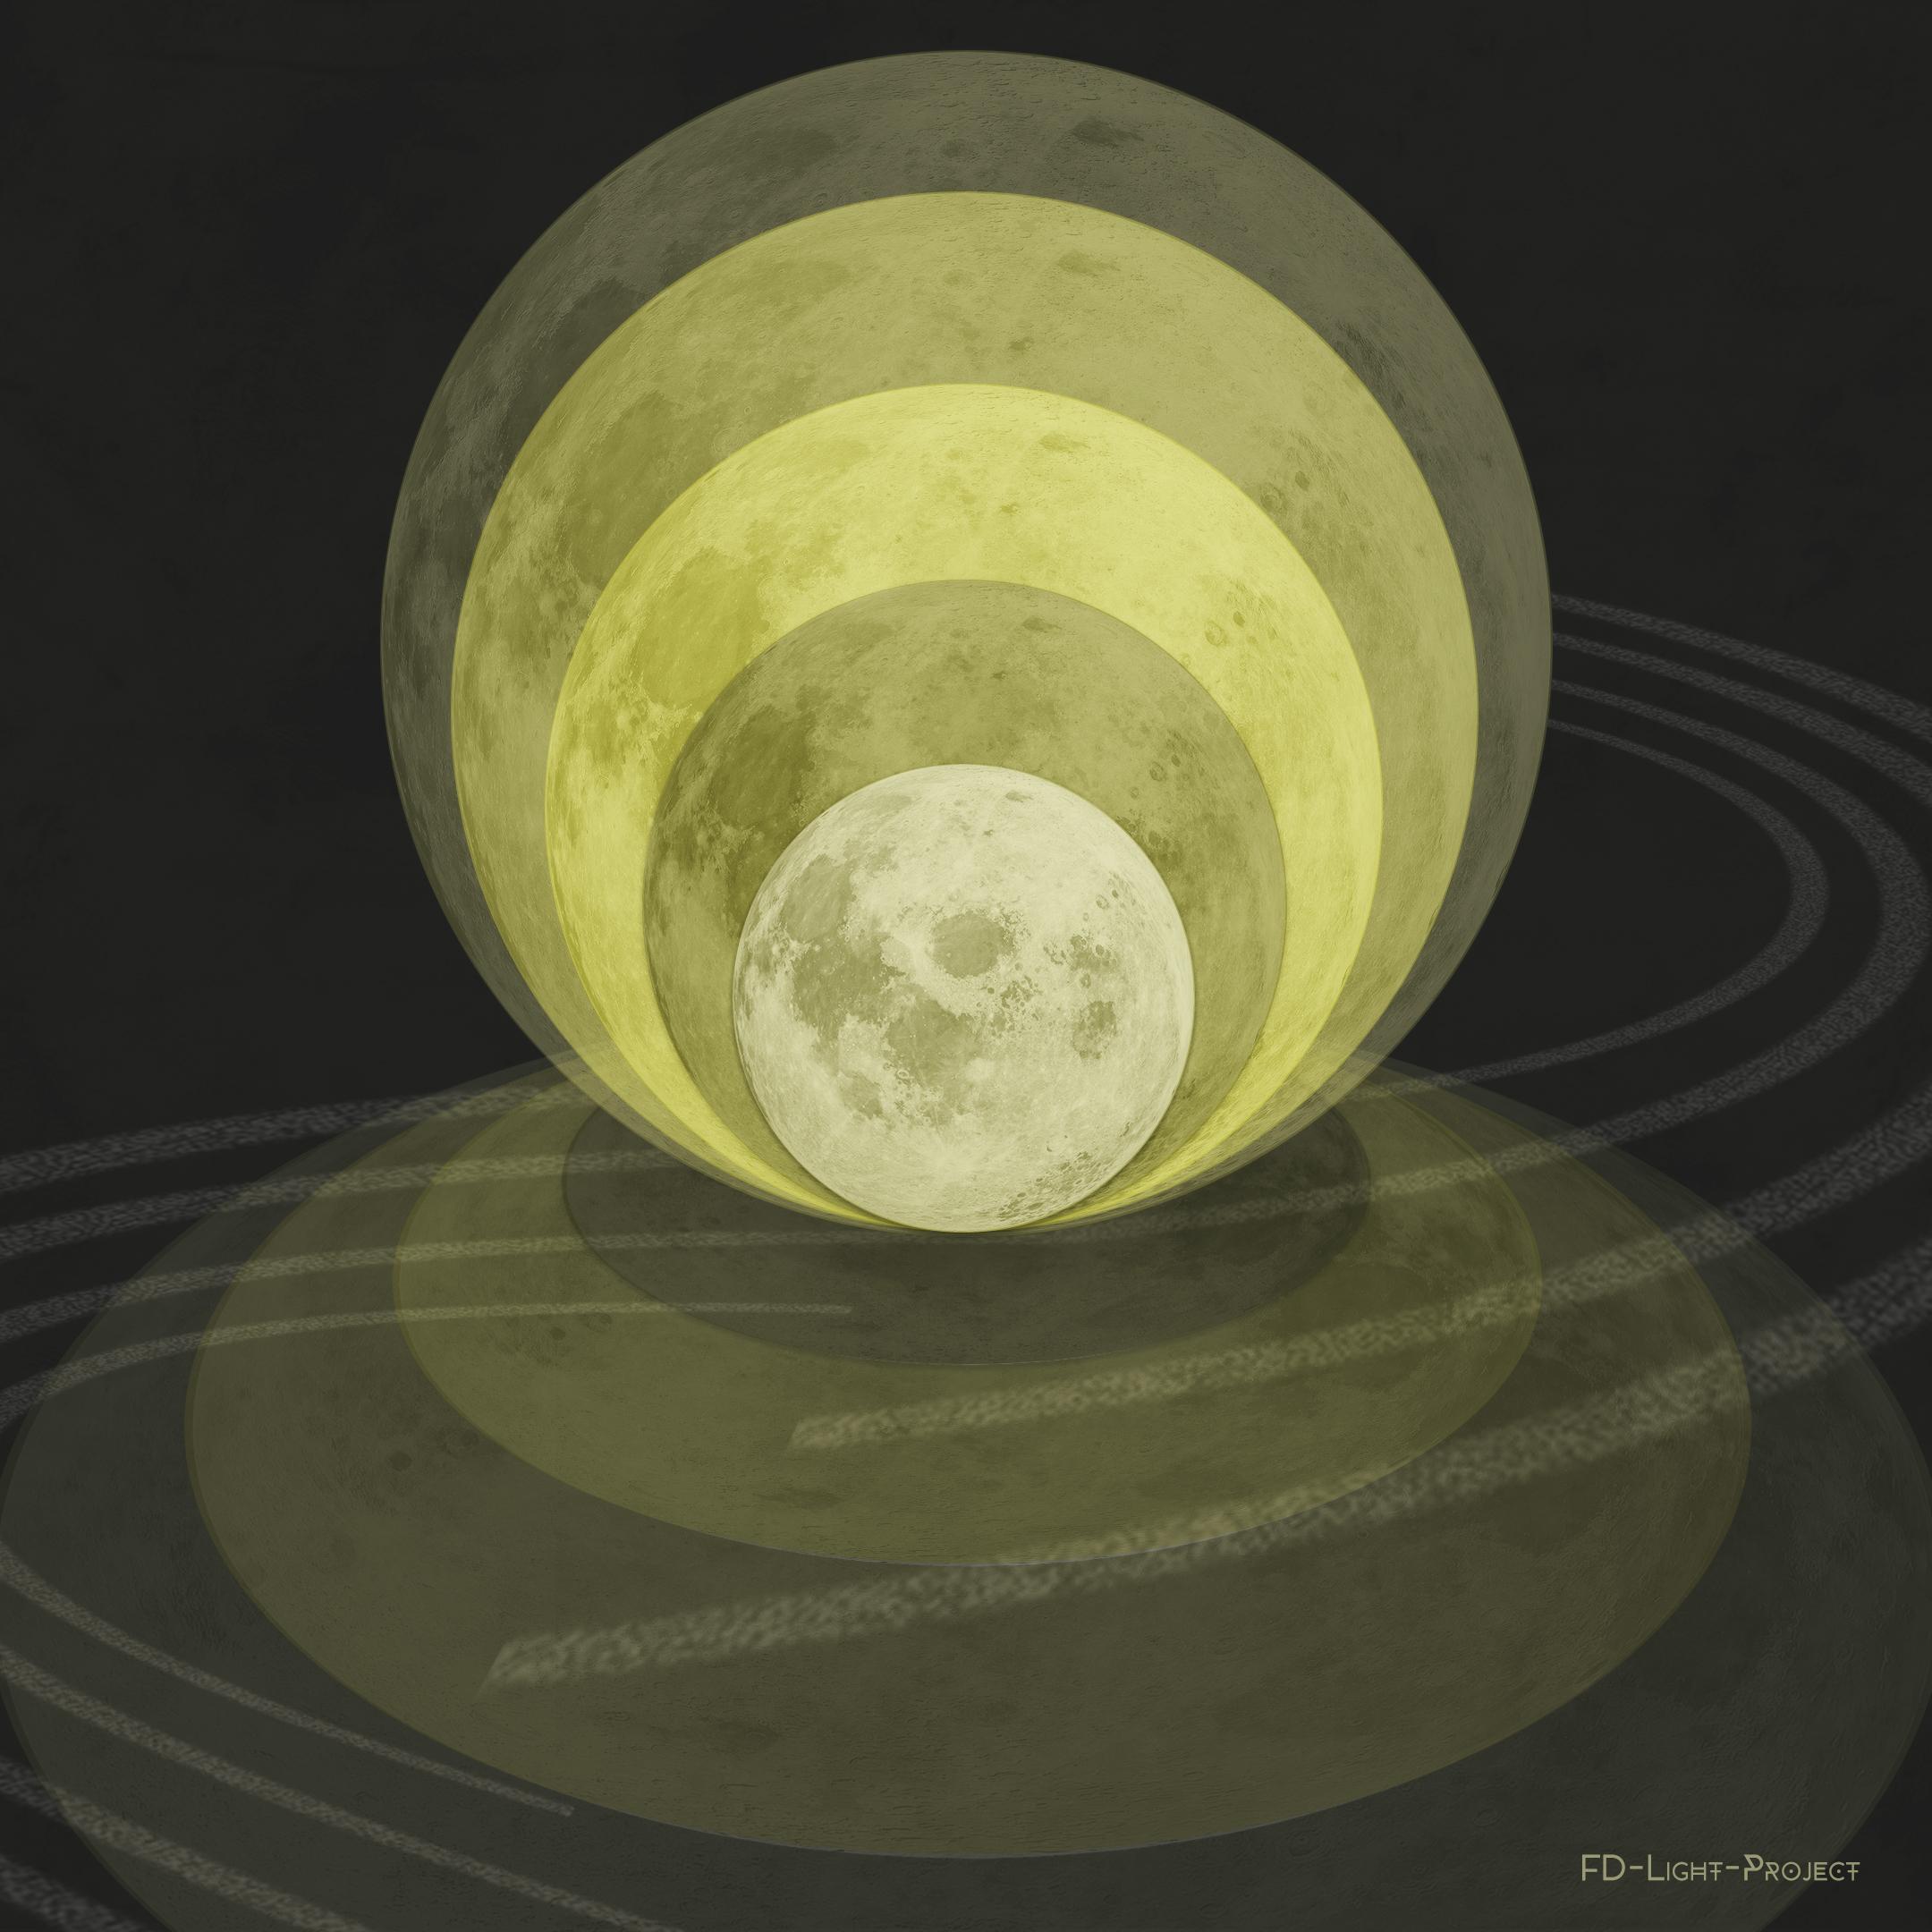 Dislocations, Orbit of the Moon - FD-Light-Project